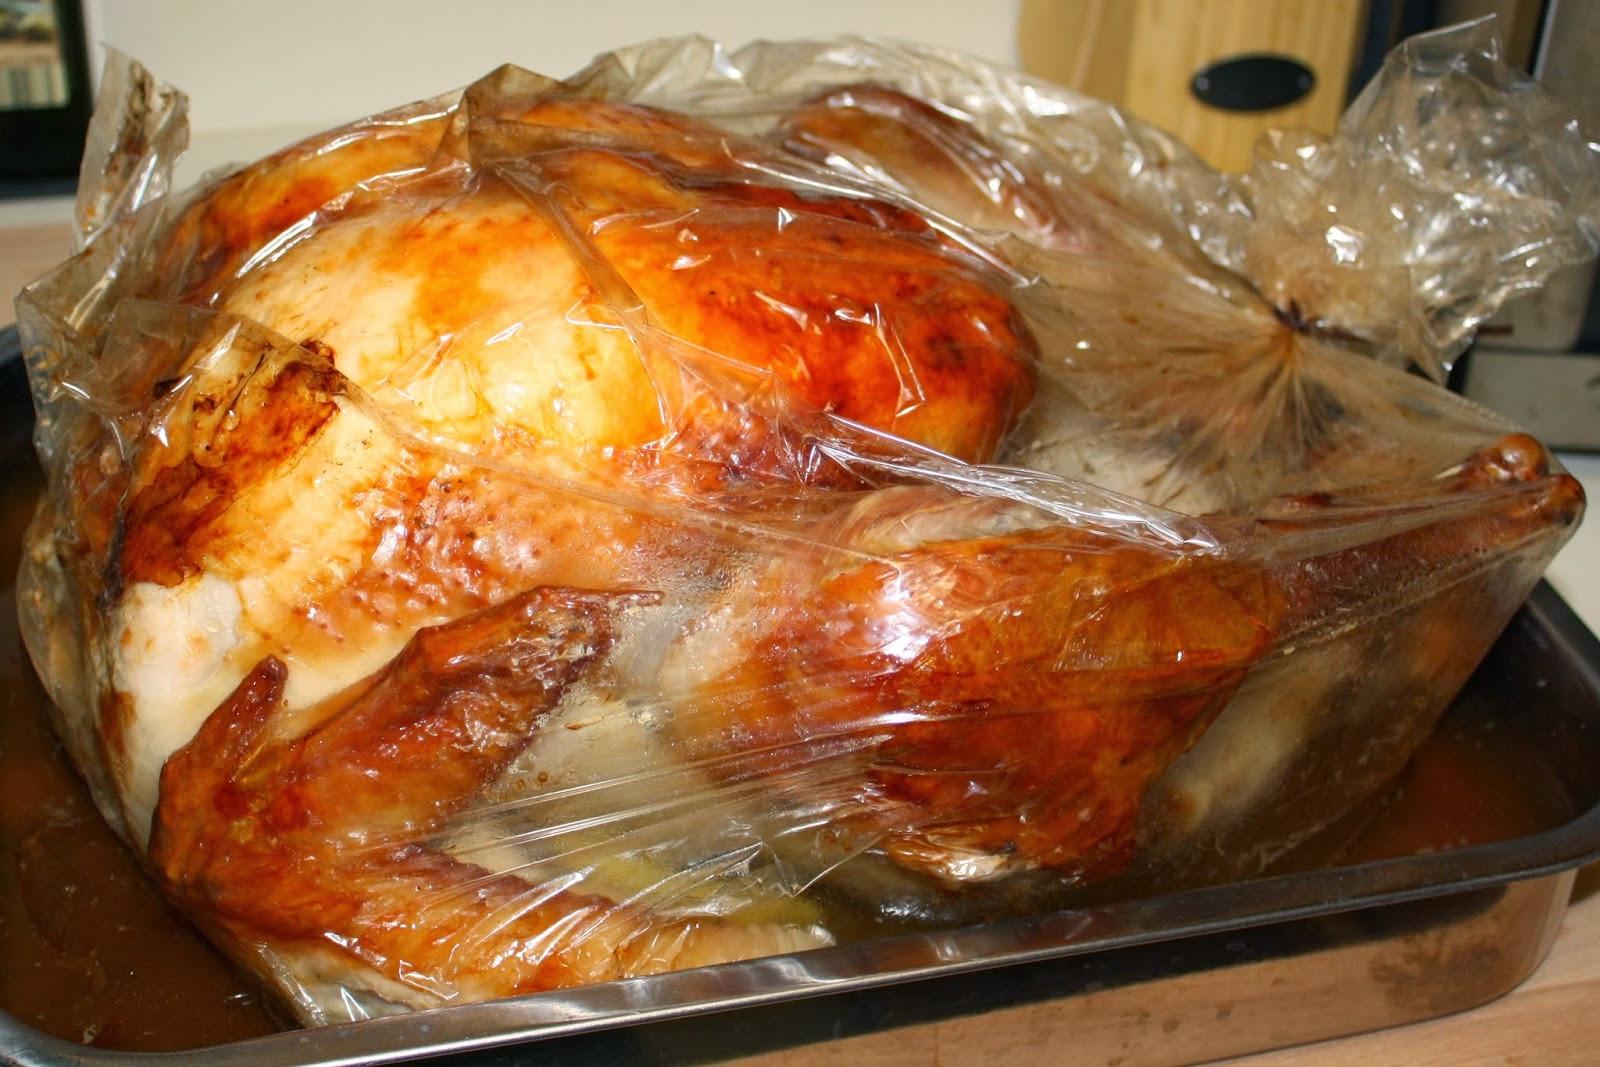 Baking Thanksgiving Turkey  EmilyCanBake Turkey Brine and Bake Recipe